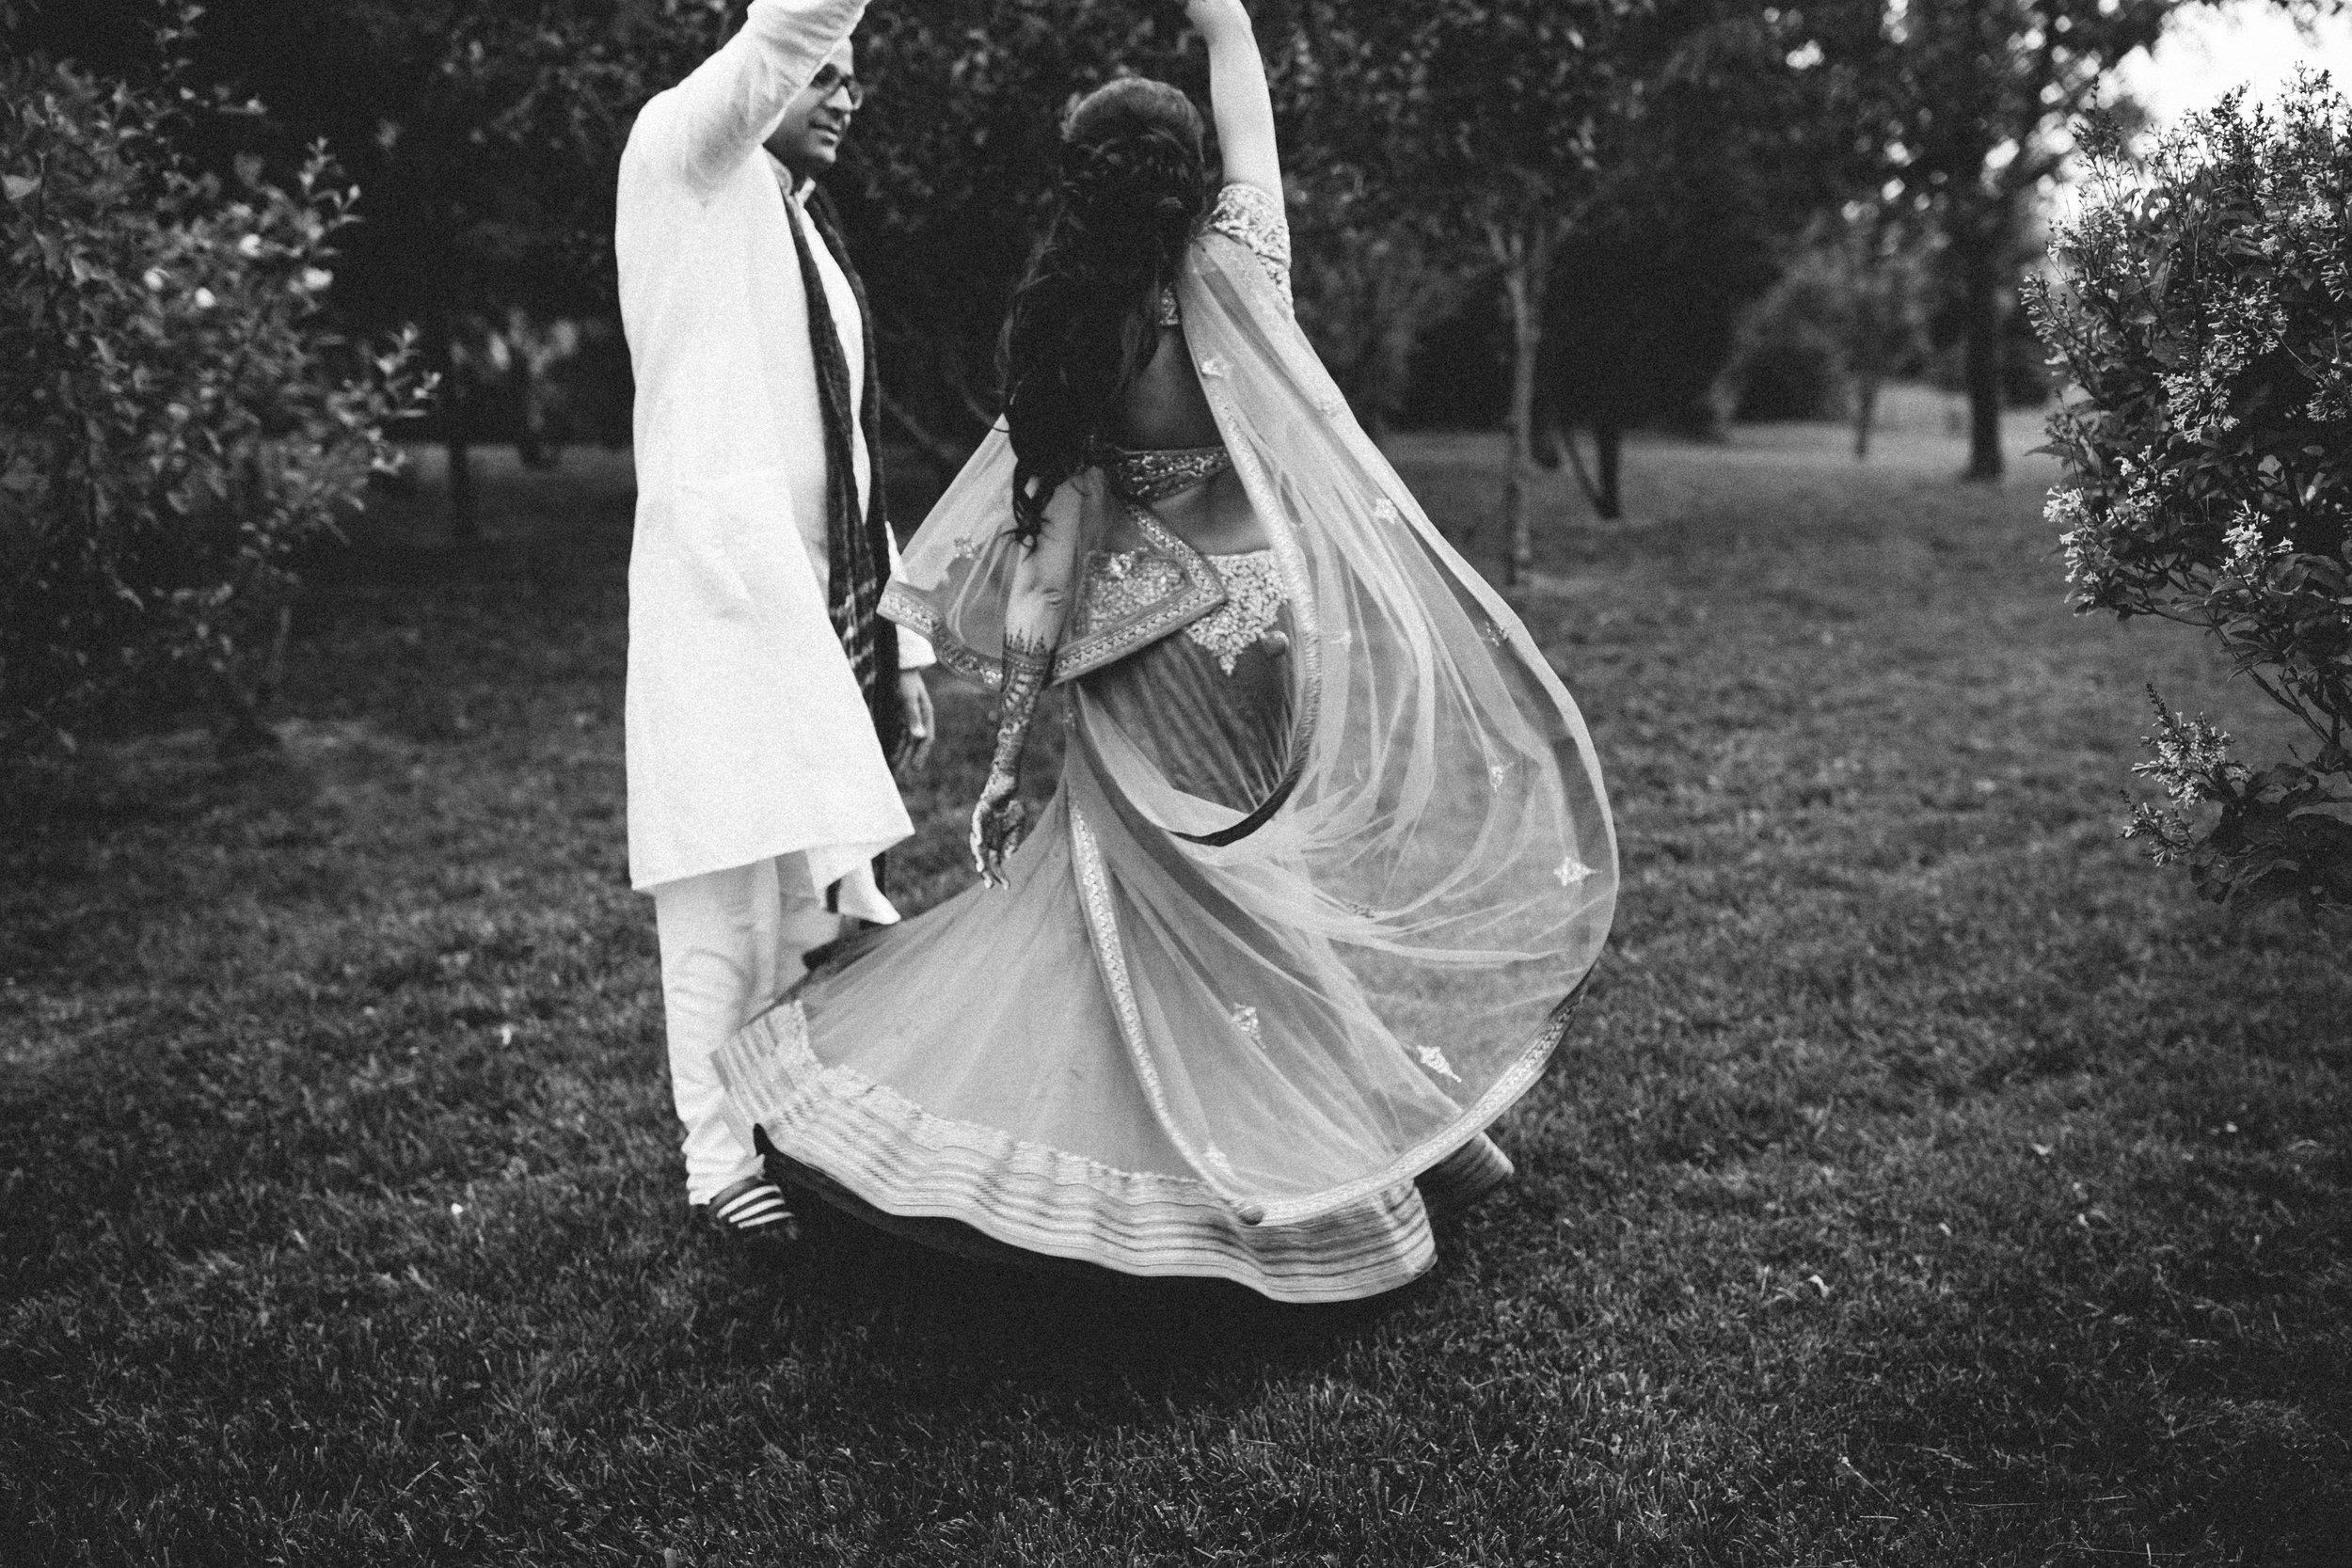 Aparna-Ankit-Patel-Mehndi-Wedding-Photos-0072.jpg